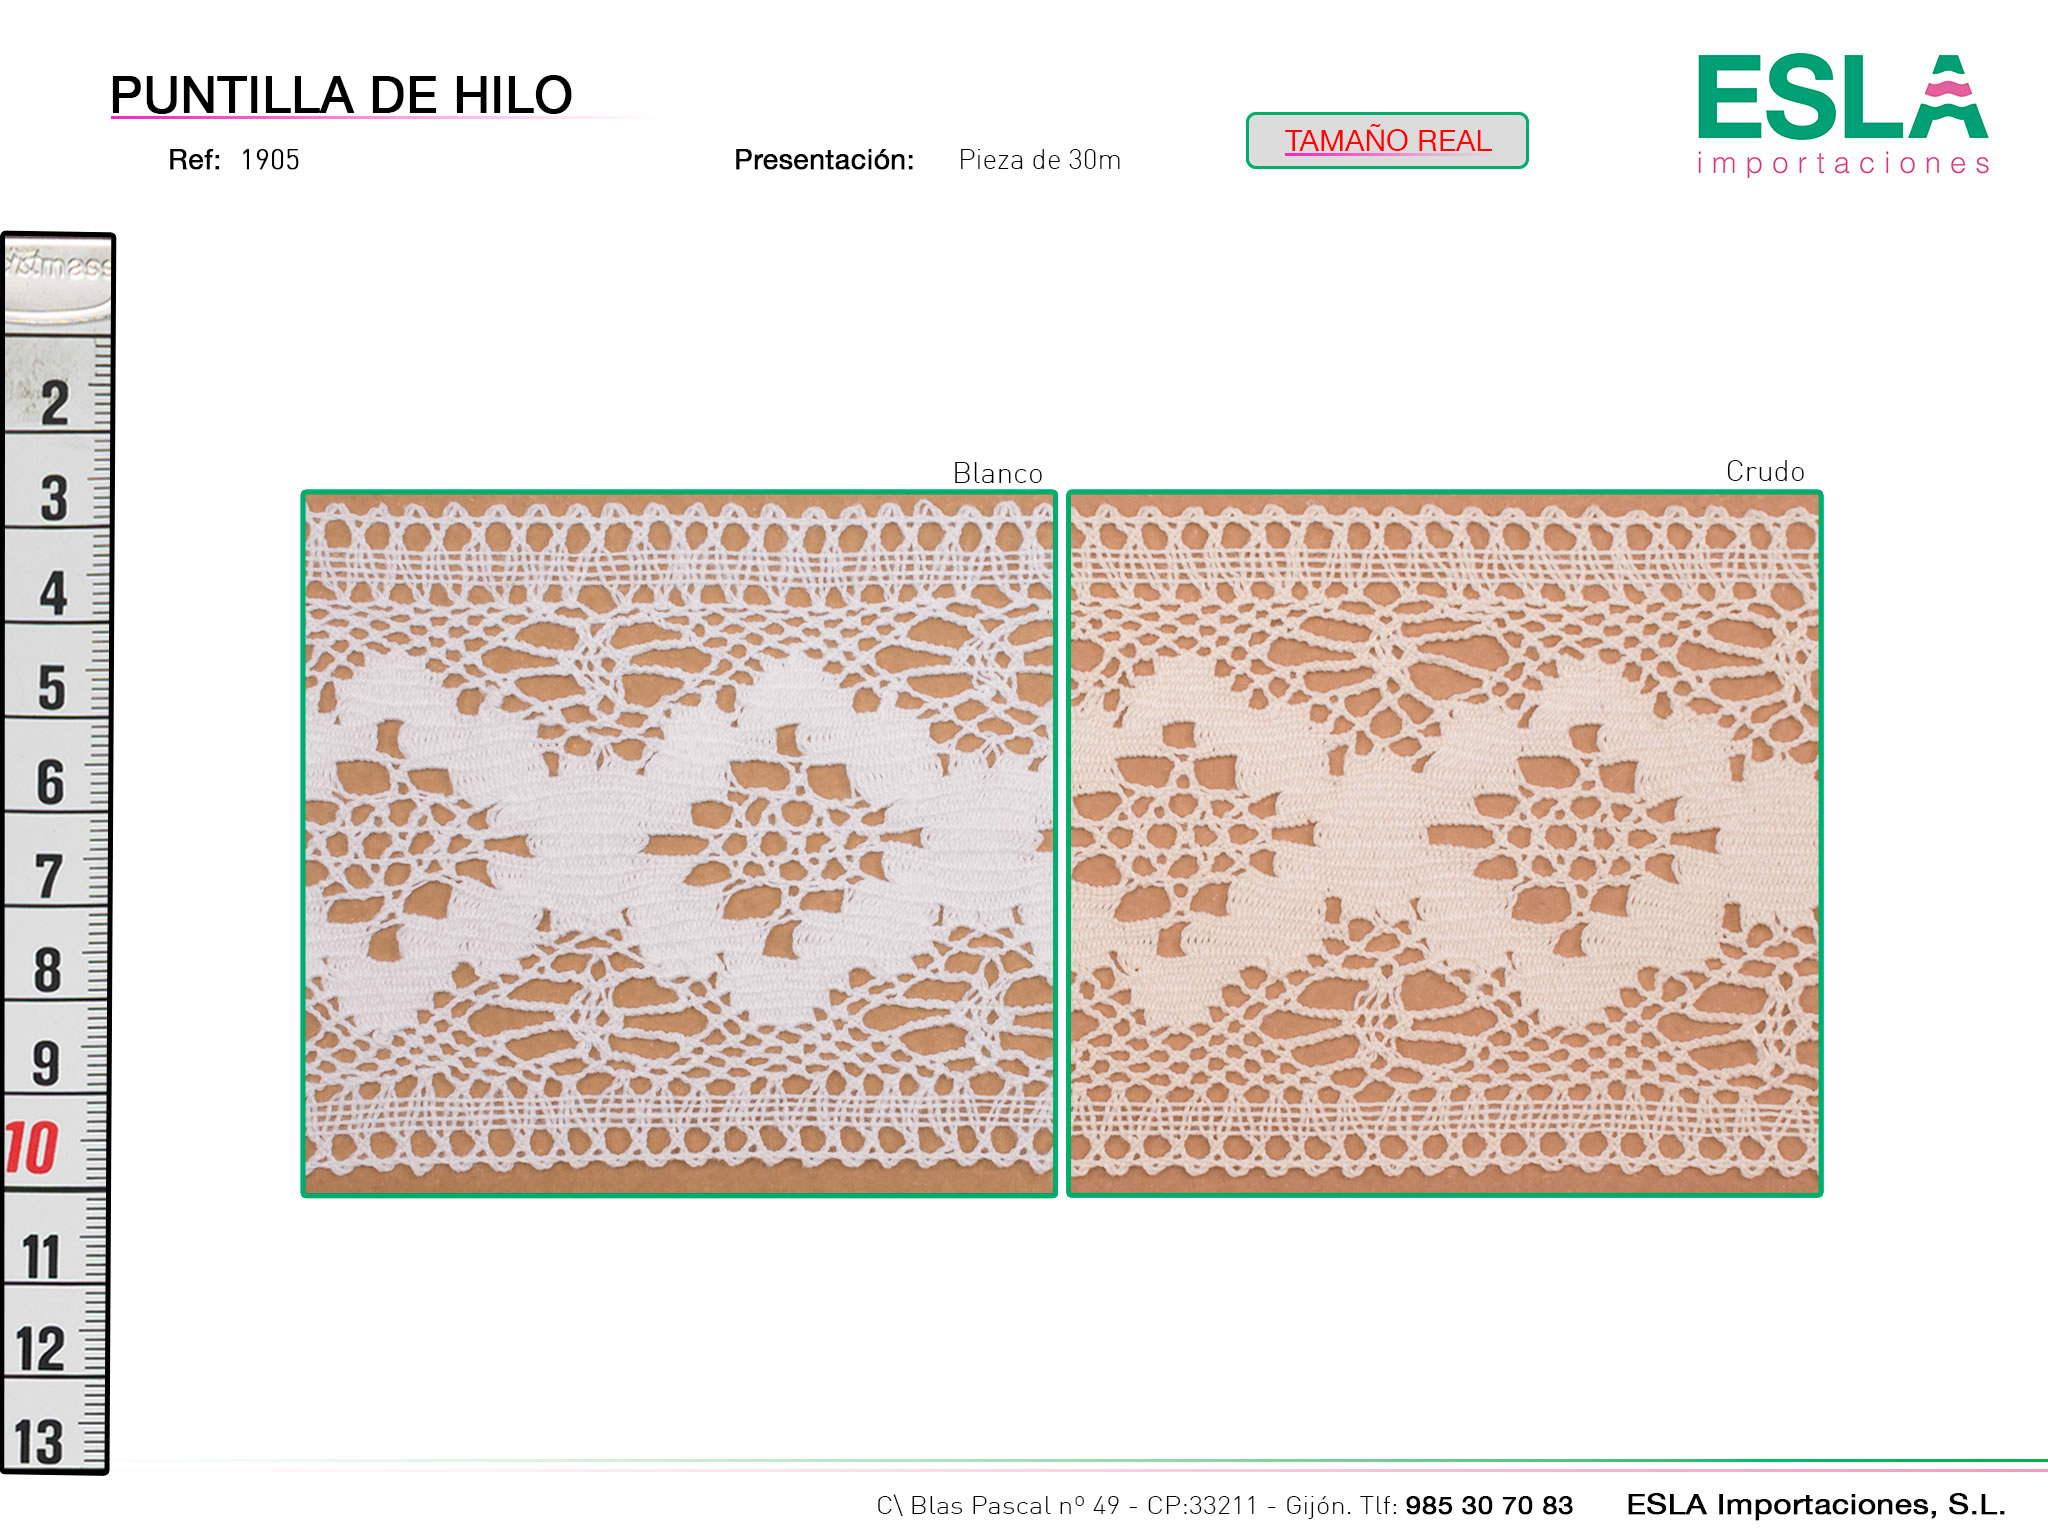 Puntilla de hilo, Familia 1904, Ref 1905